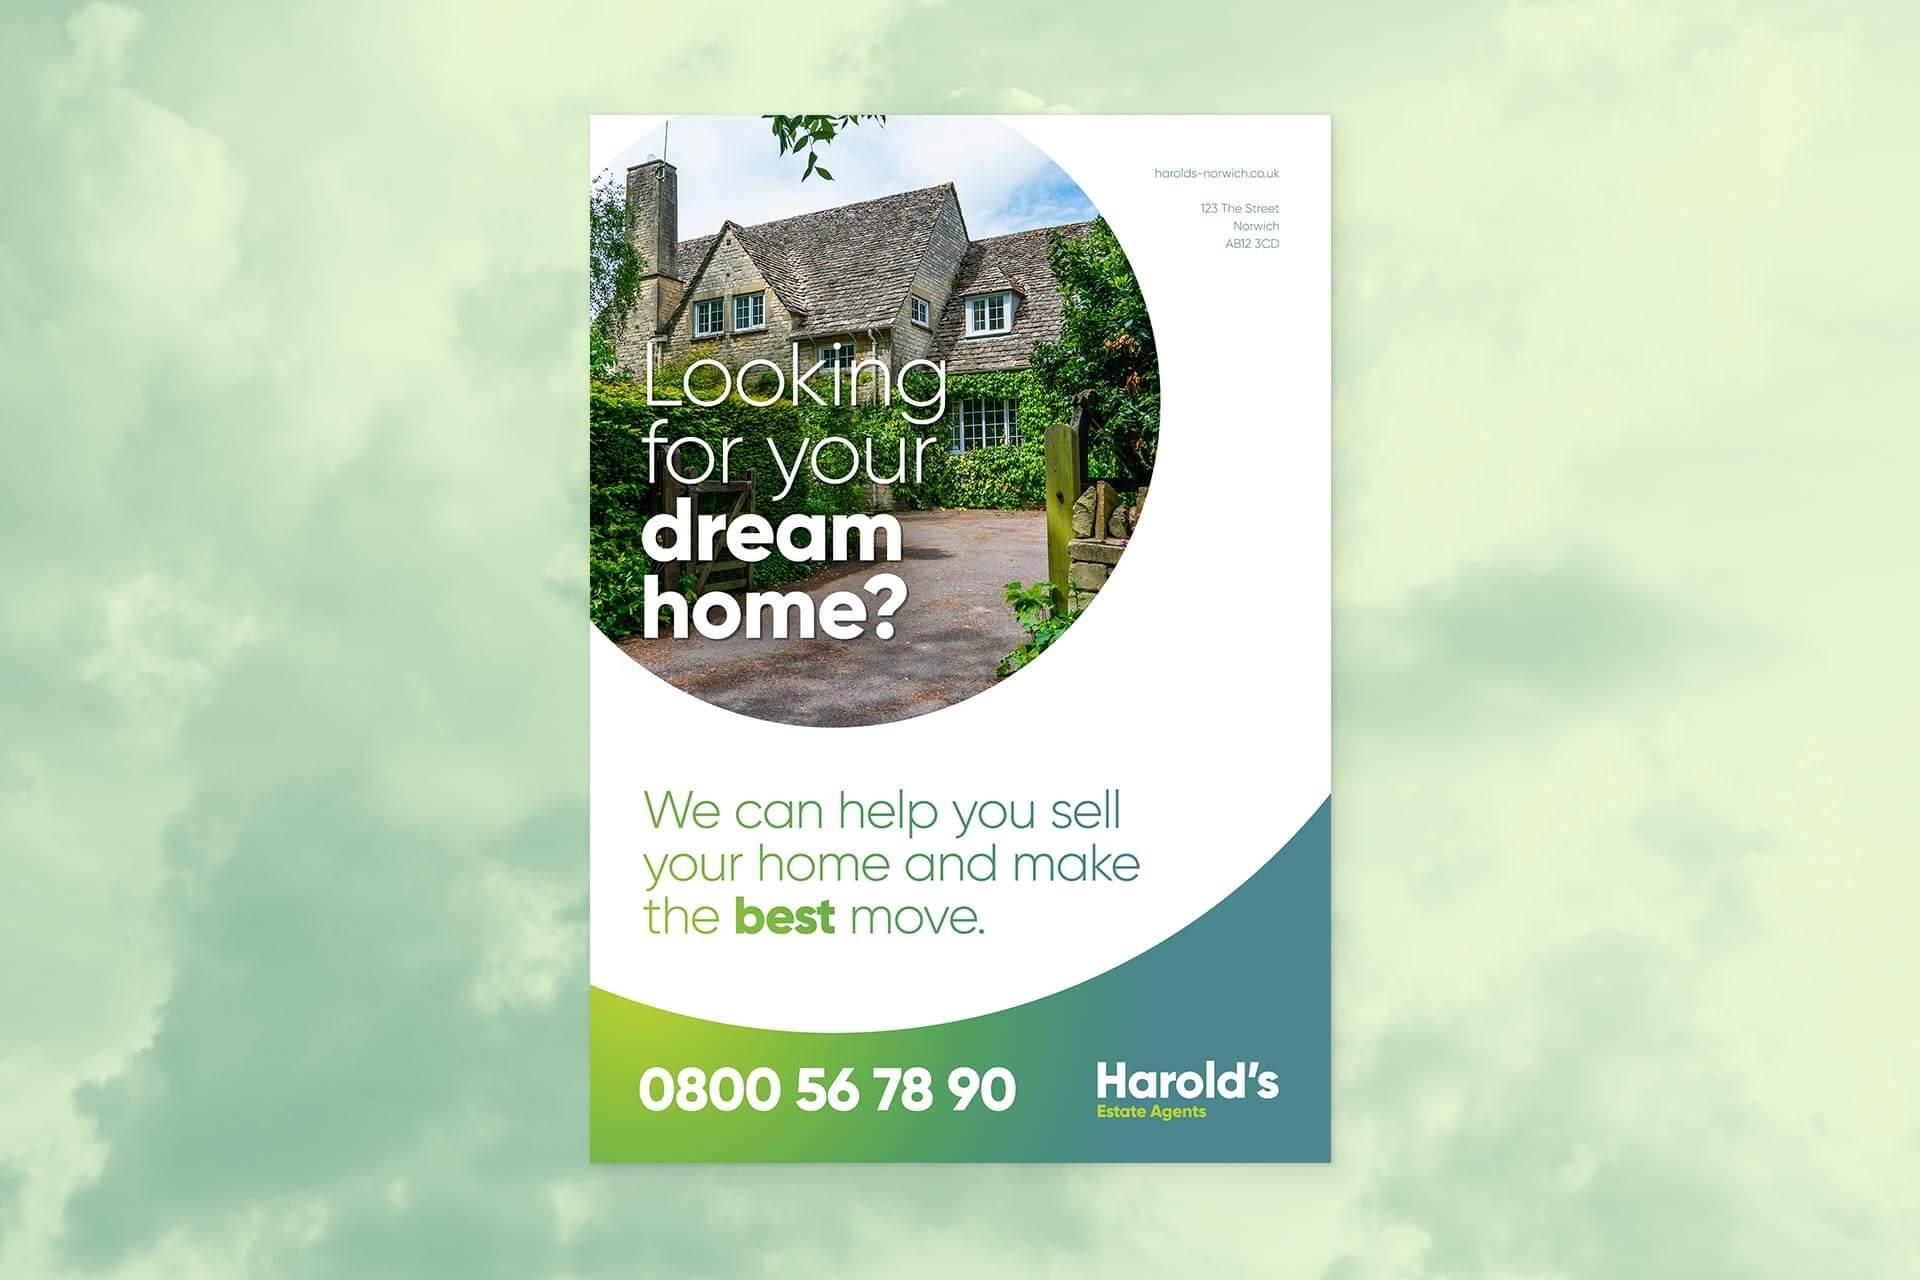 estate agents marketing ideas